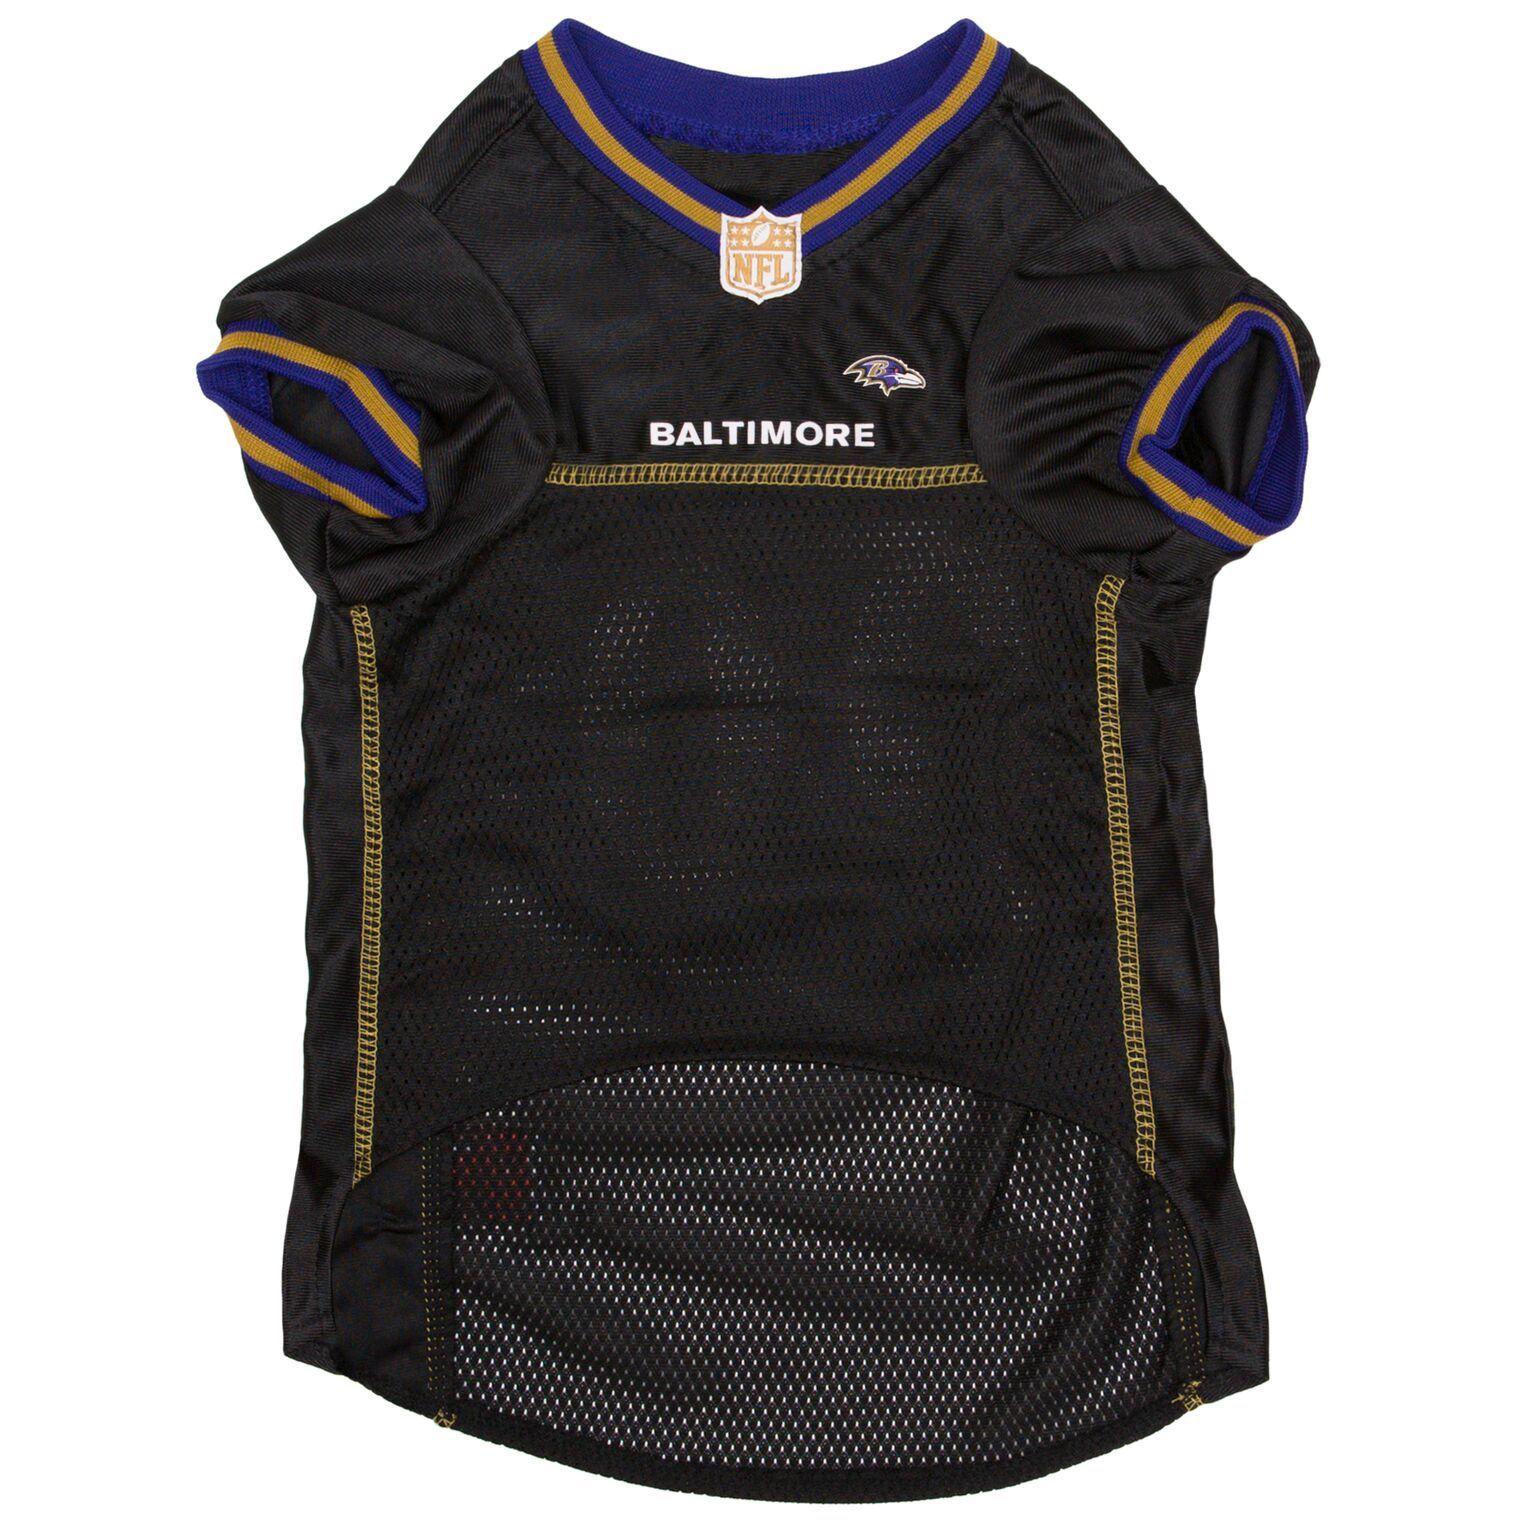 NFL Jerseys for Dogs Dog Pro Team Football Jersey